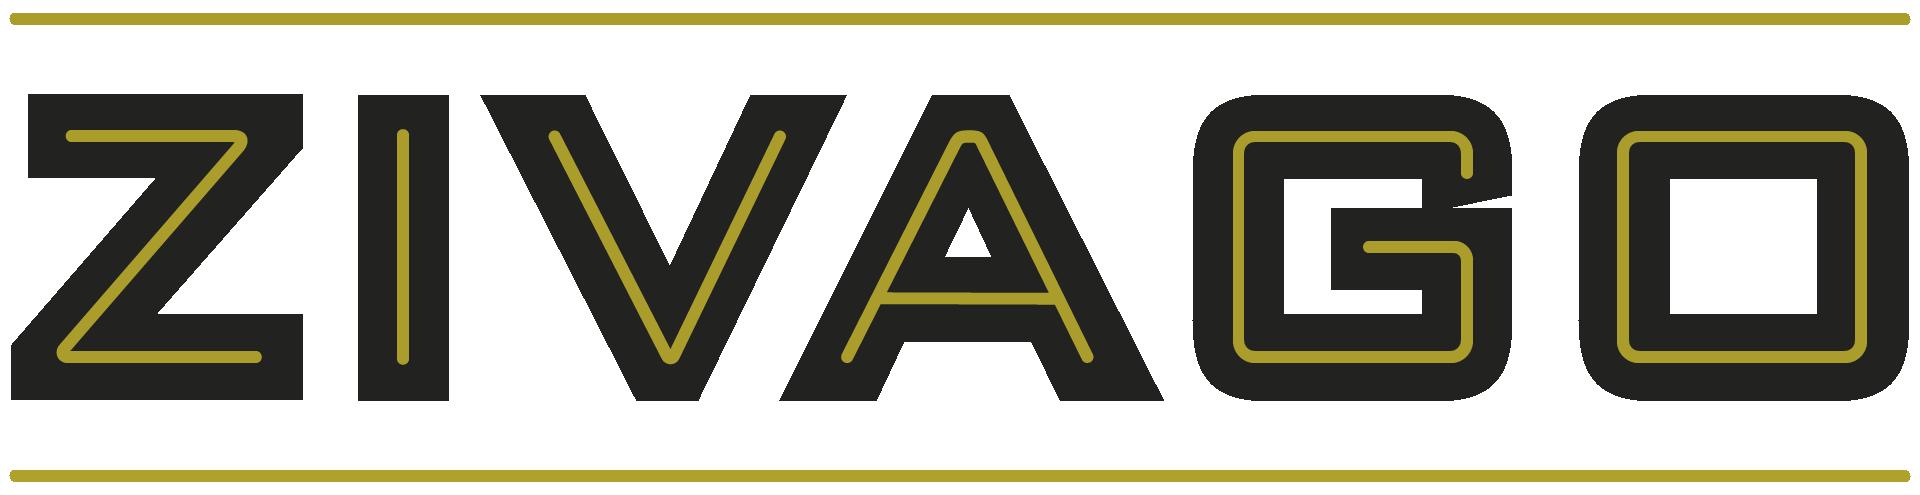 Ziv_v